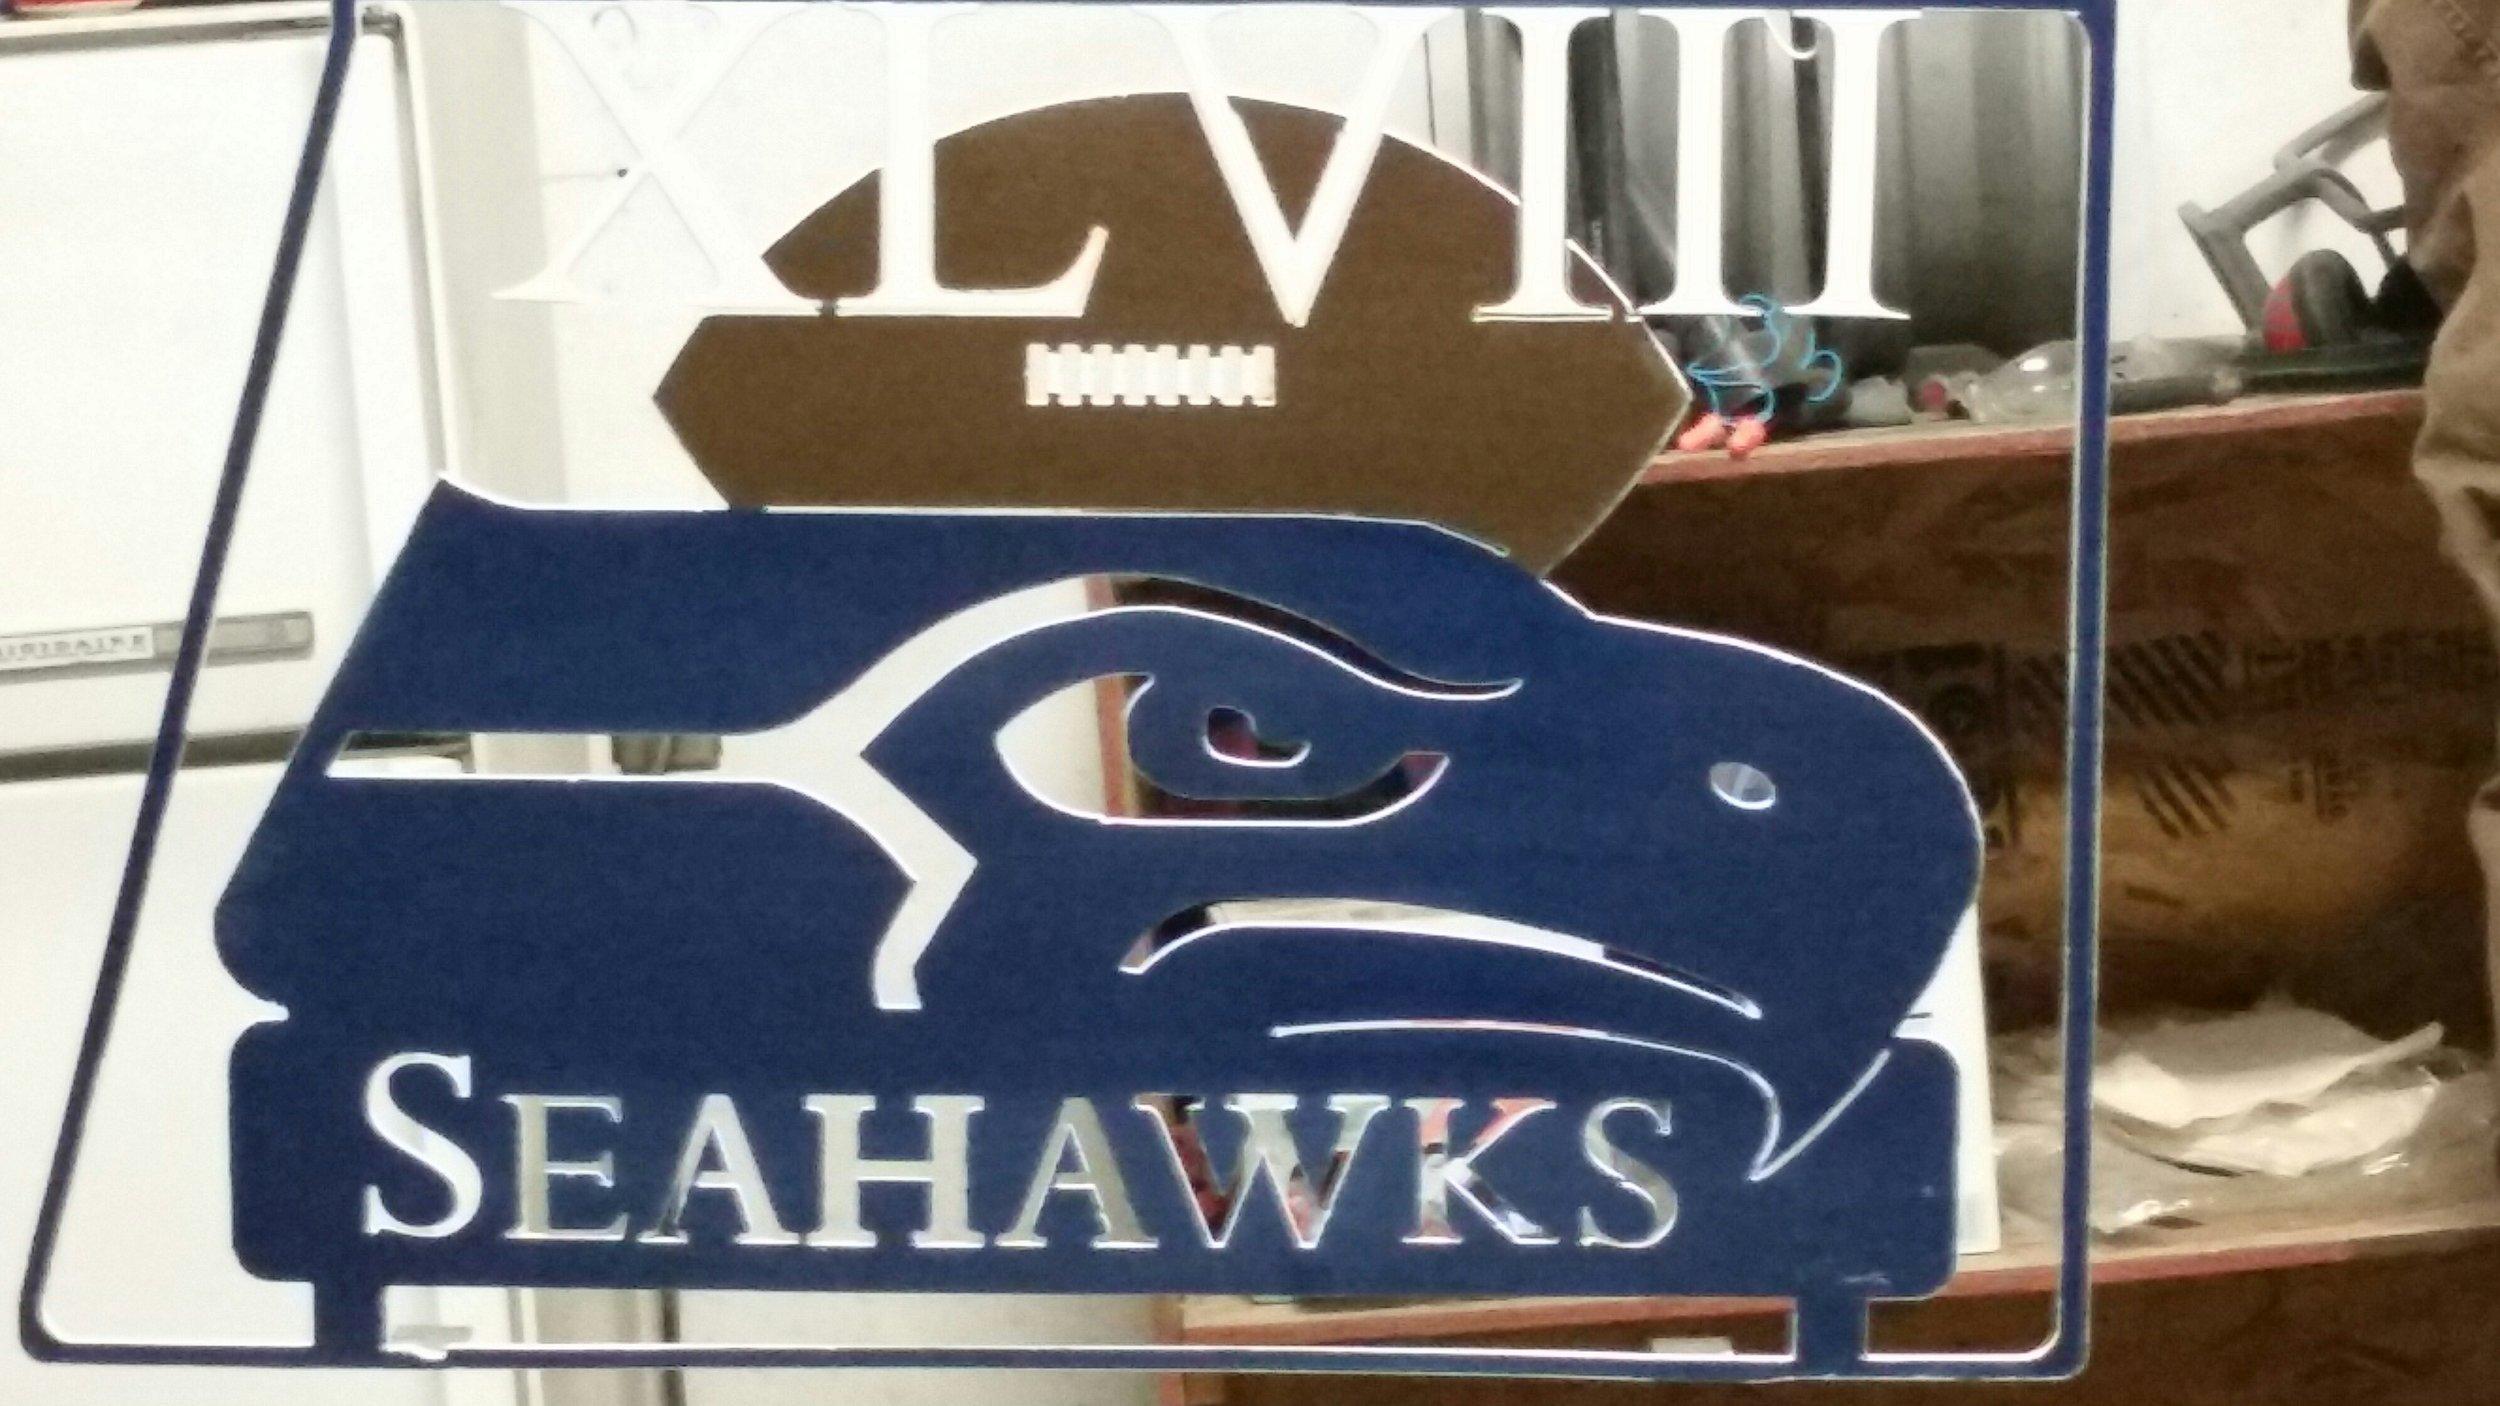 SEAHAWKS SIGN.jpg